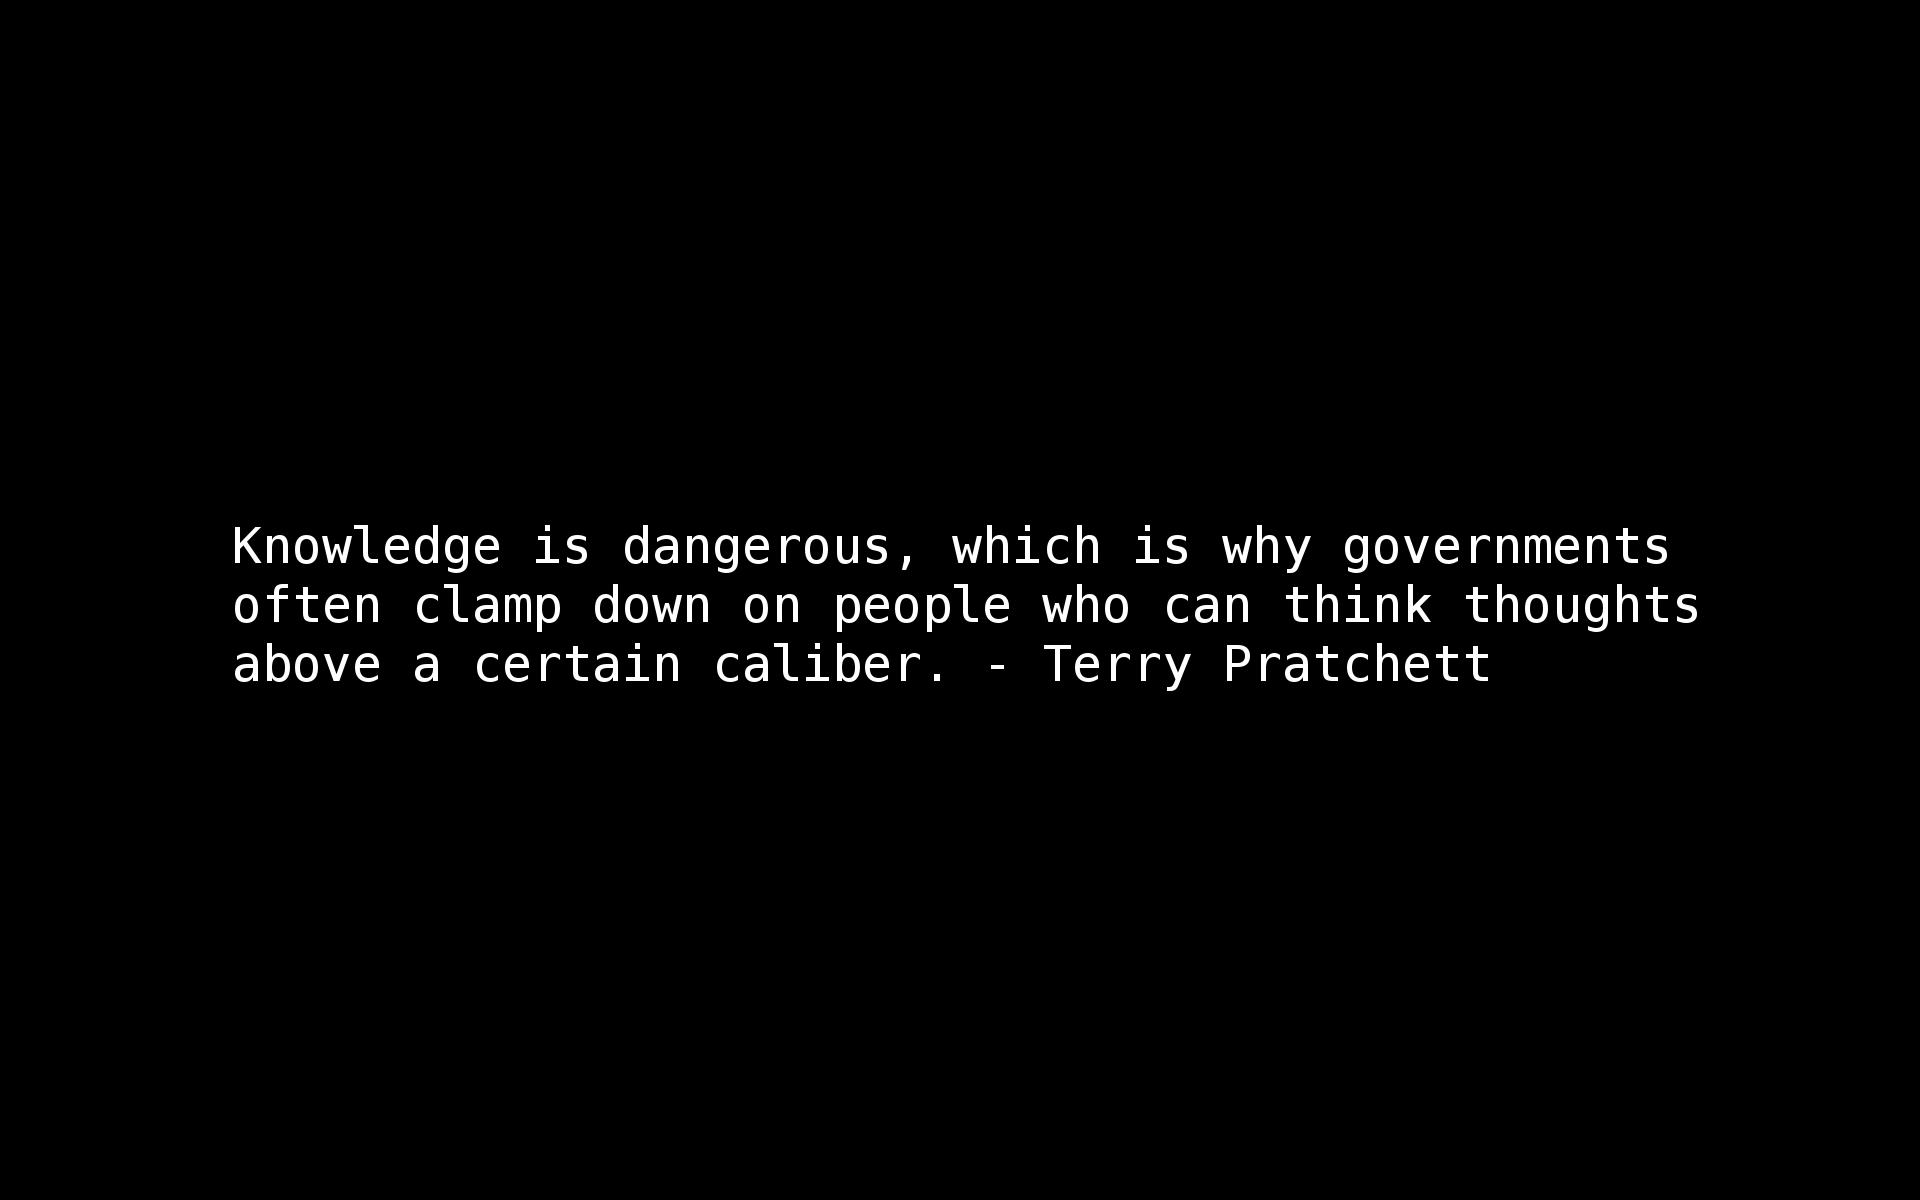 Quotes terry pratchett knowledge wallpaper 1920x1200 8560 1920x1200